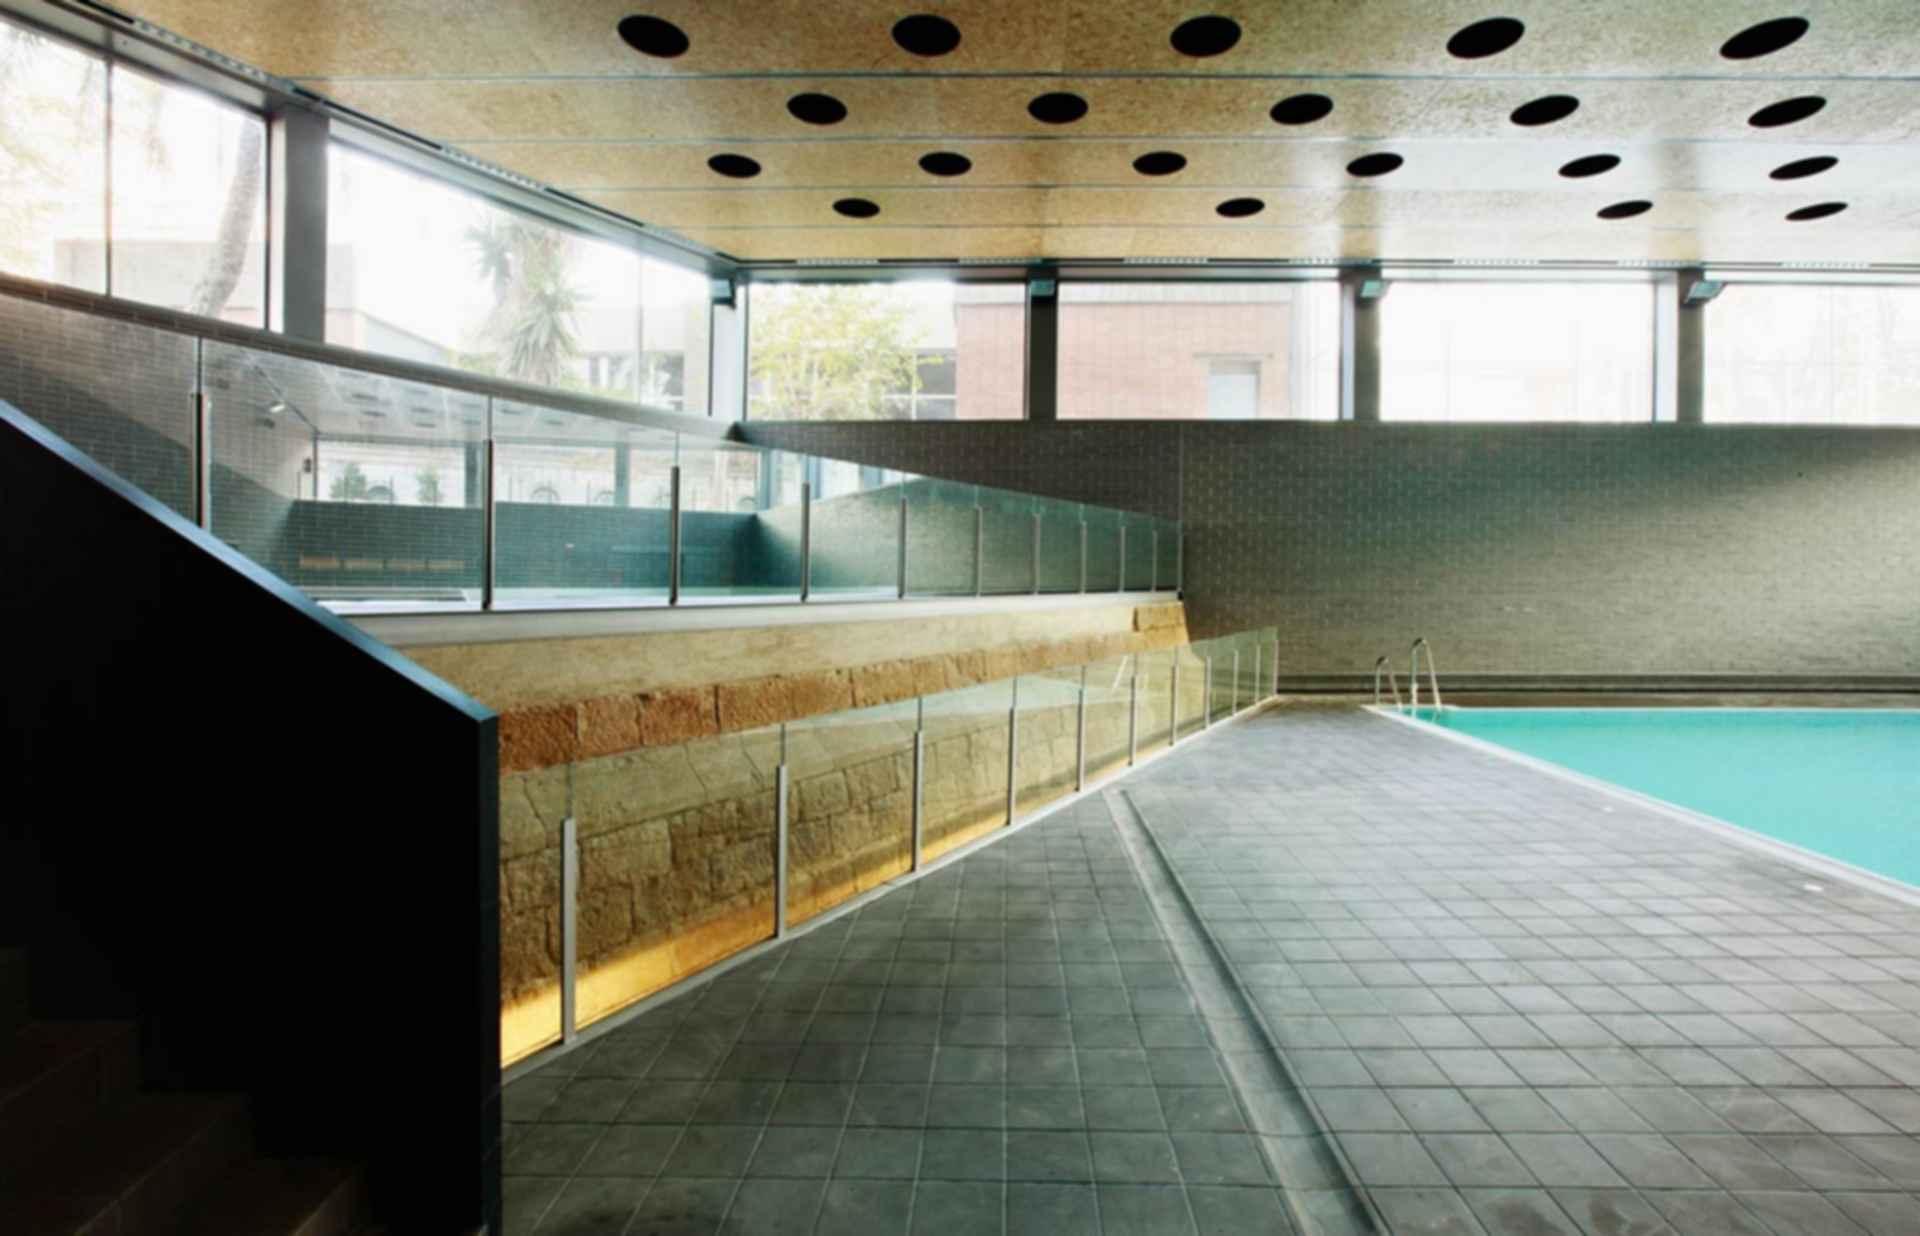 Ciutadella Park Sports Center - Interior/Pool